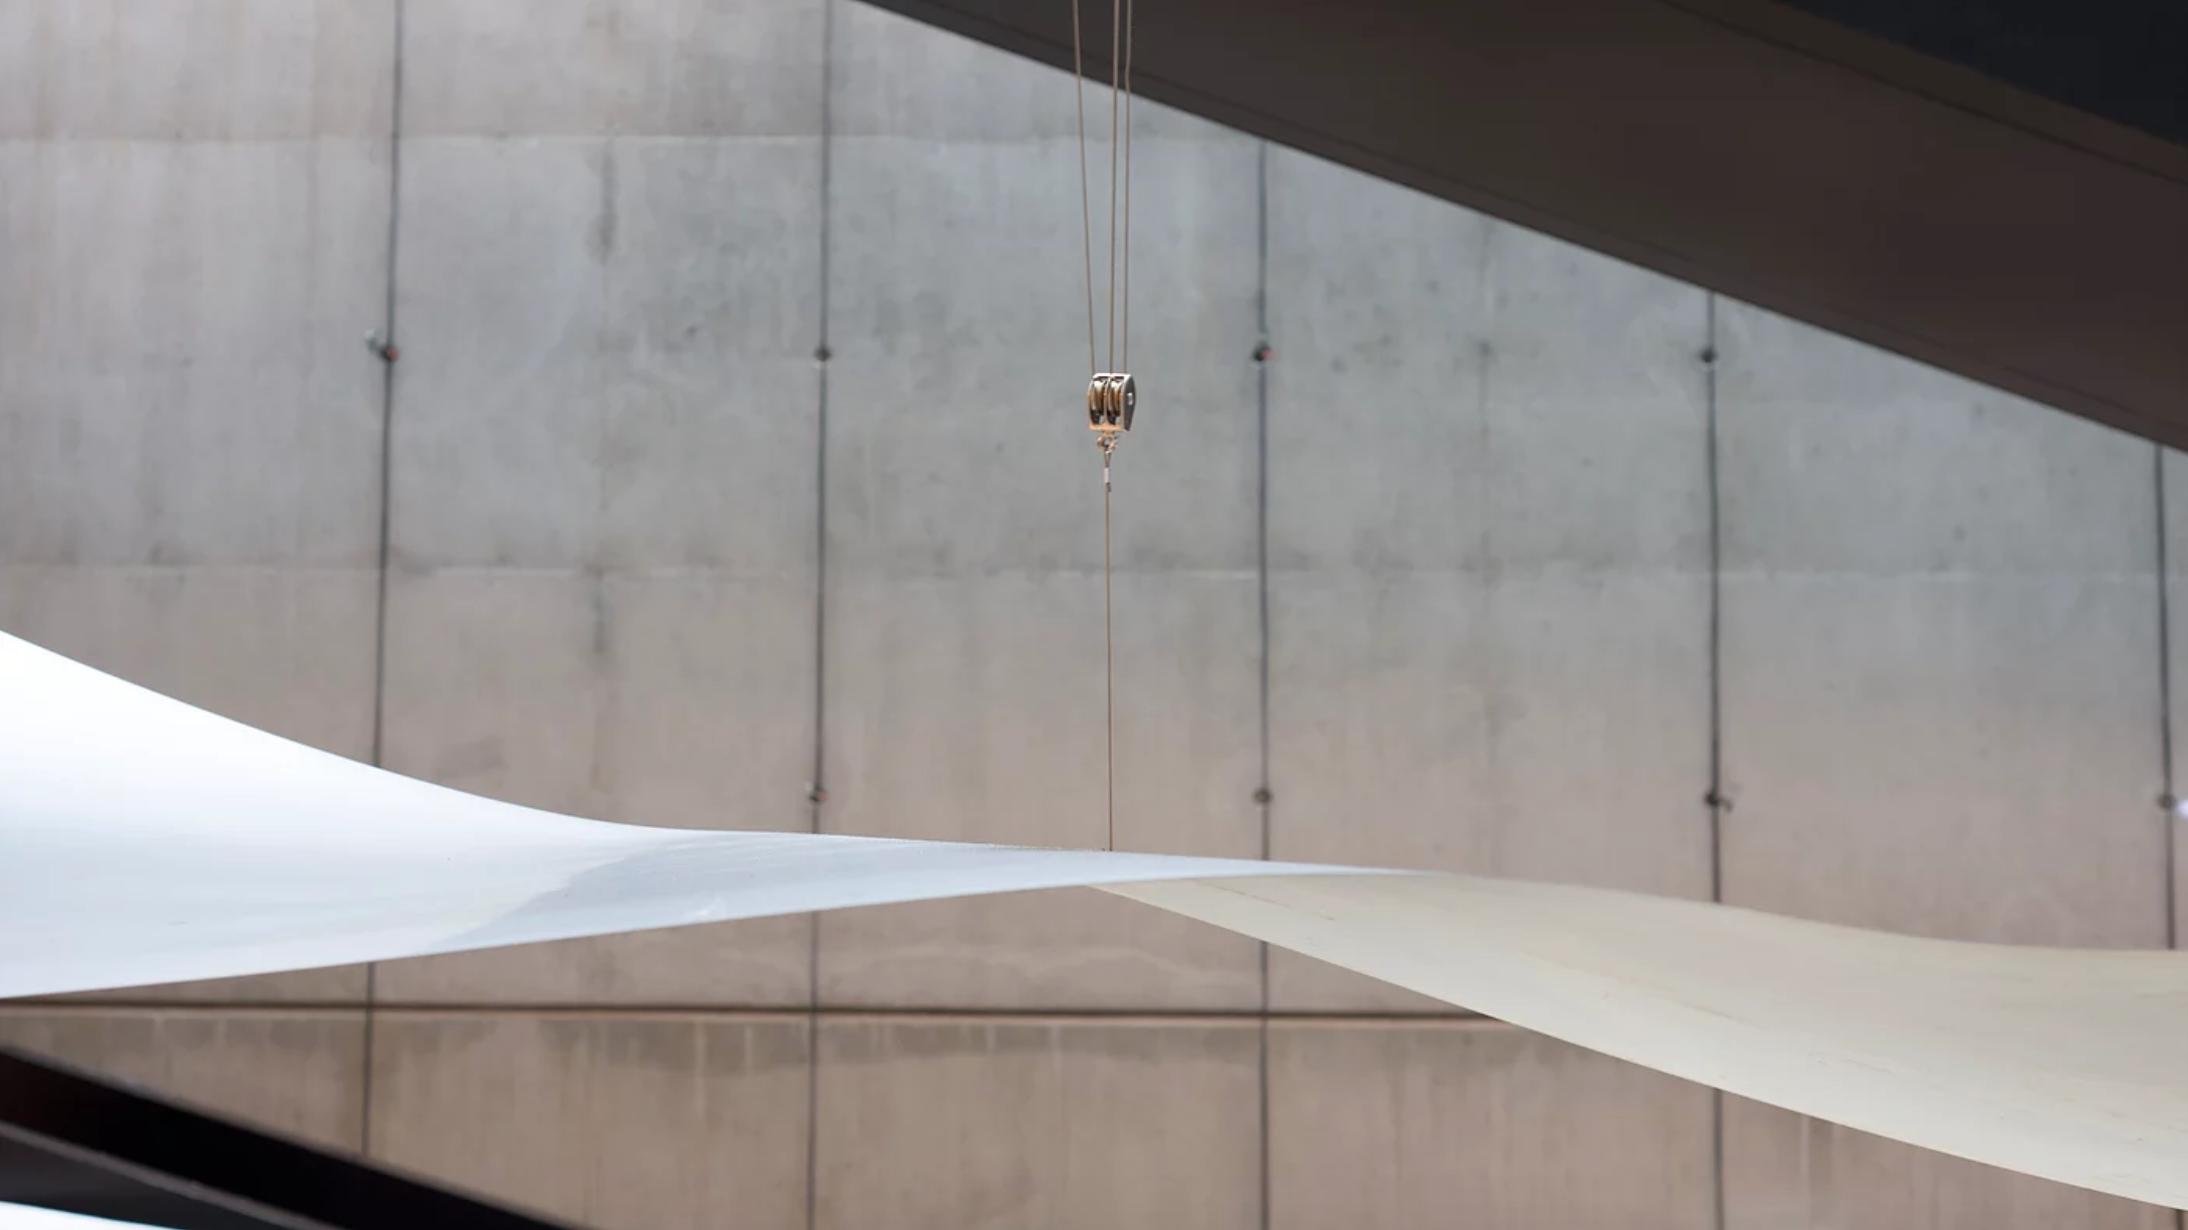 2017 Thesis Exhibition - Contemporary Arts Center